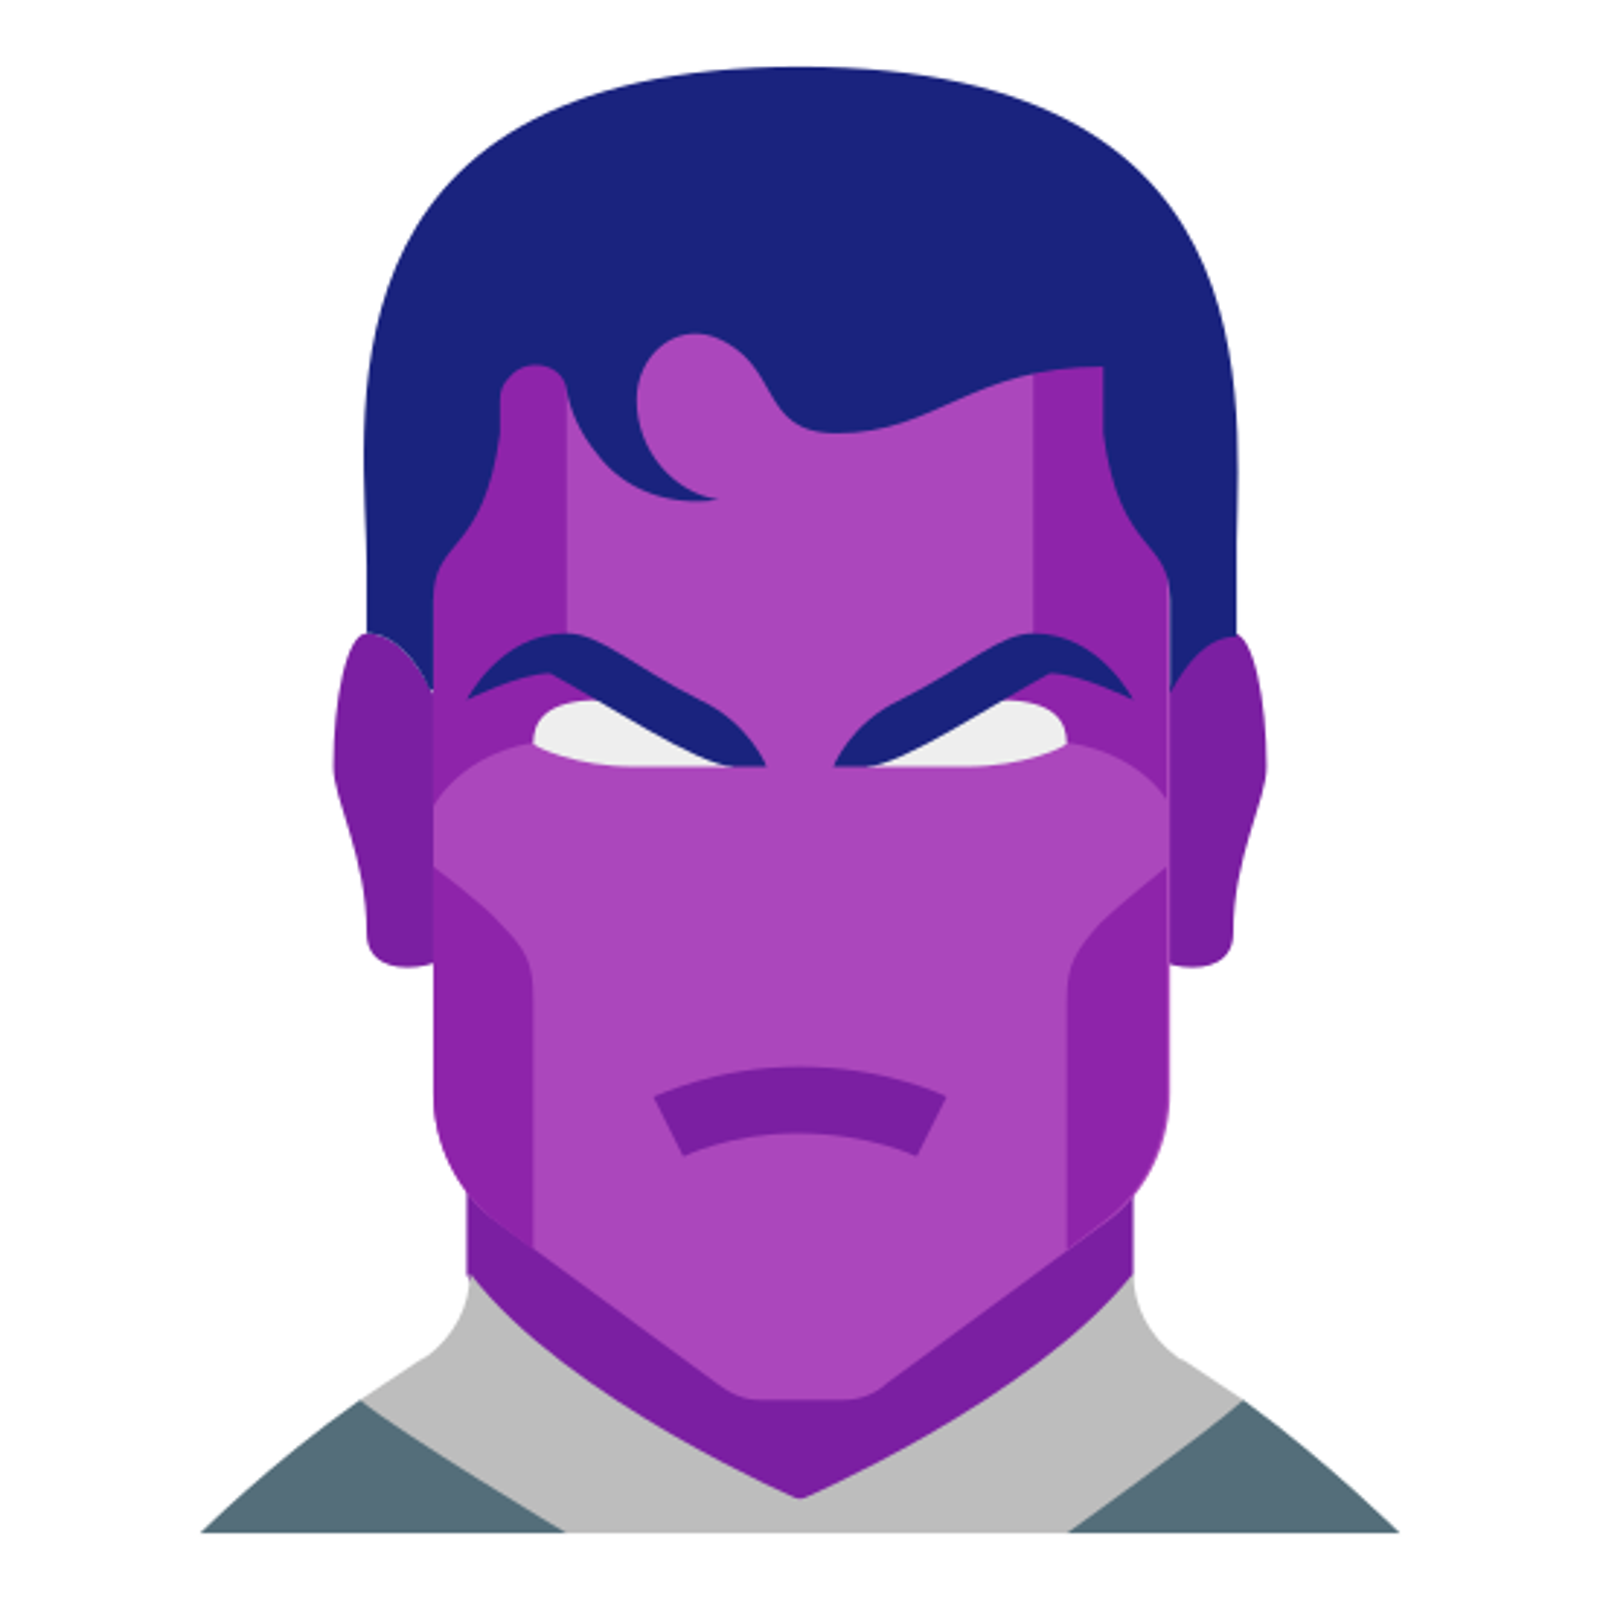 Purple Man icon